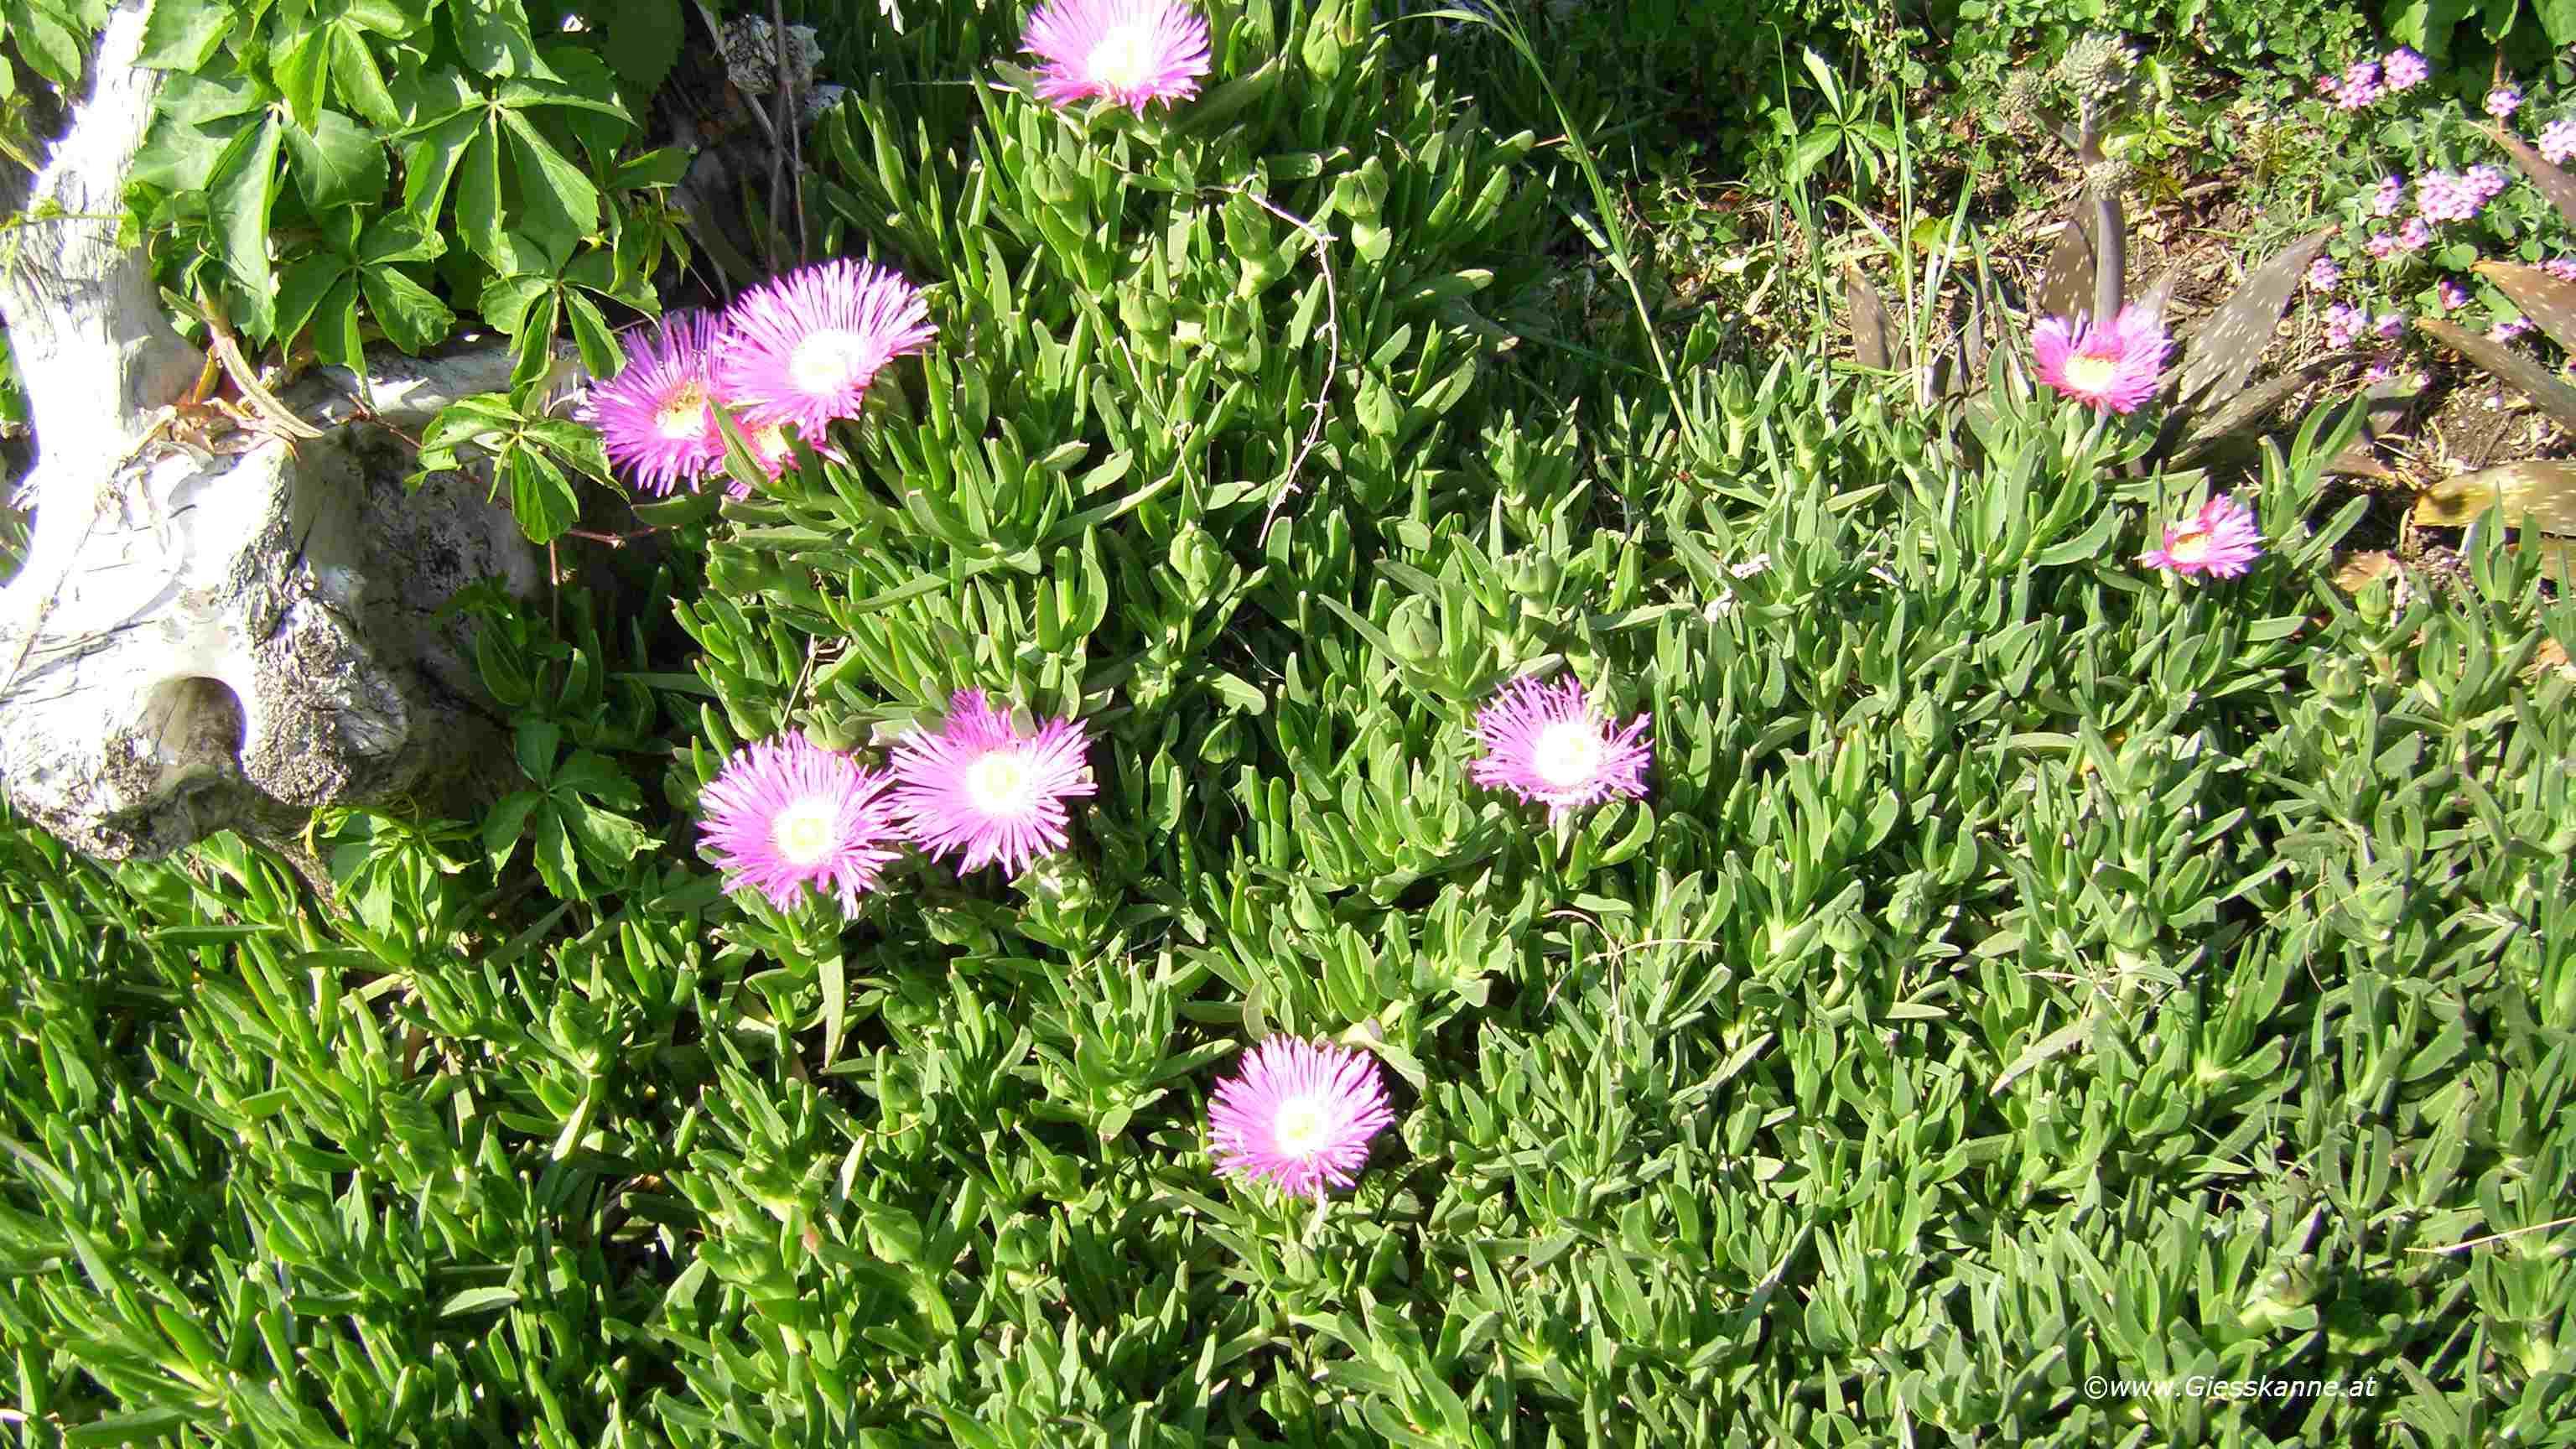 3 Ableger vpm der Hottentottenfeige Mittagsblume Carpobrotus acinaciformis pink